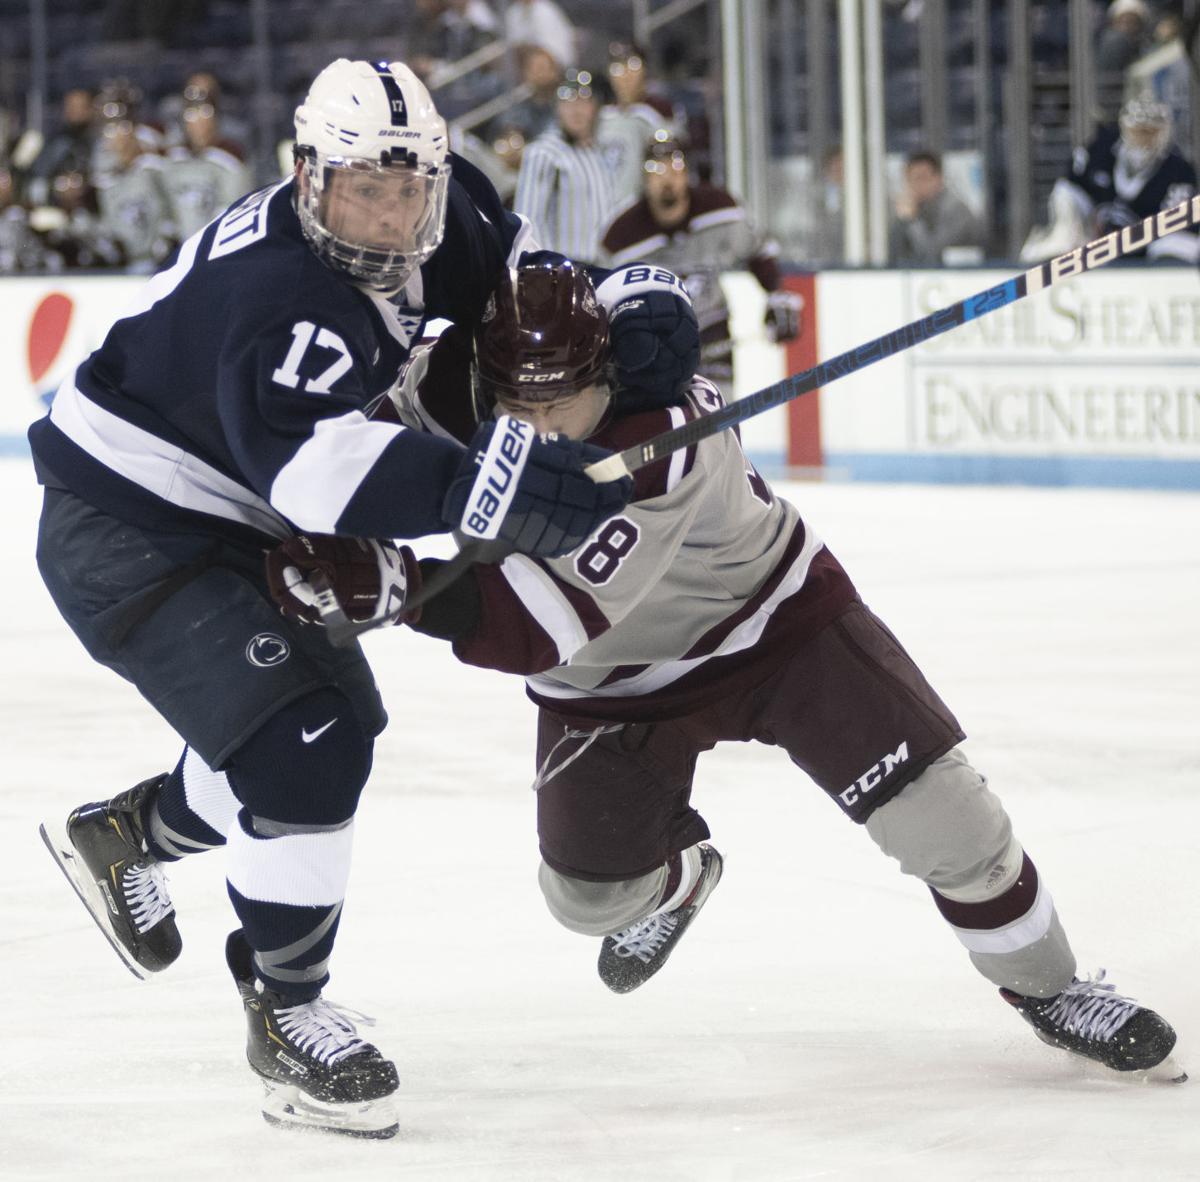 Men's hockey vs. Ottawa, Barratt (17)